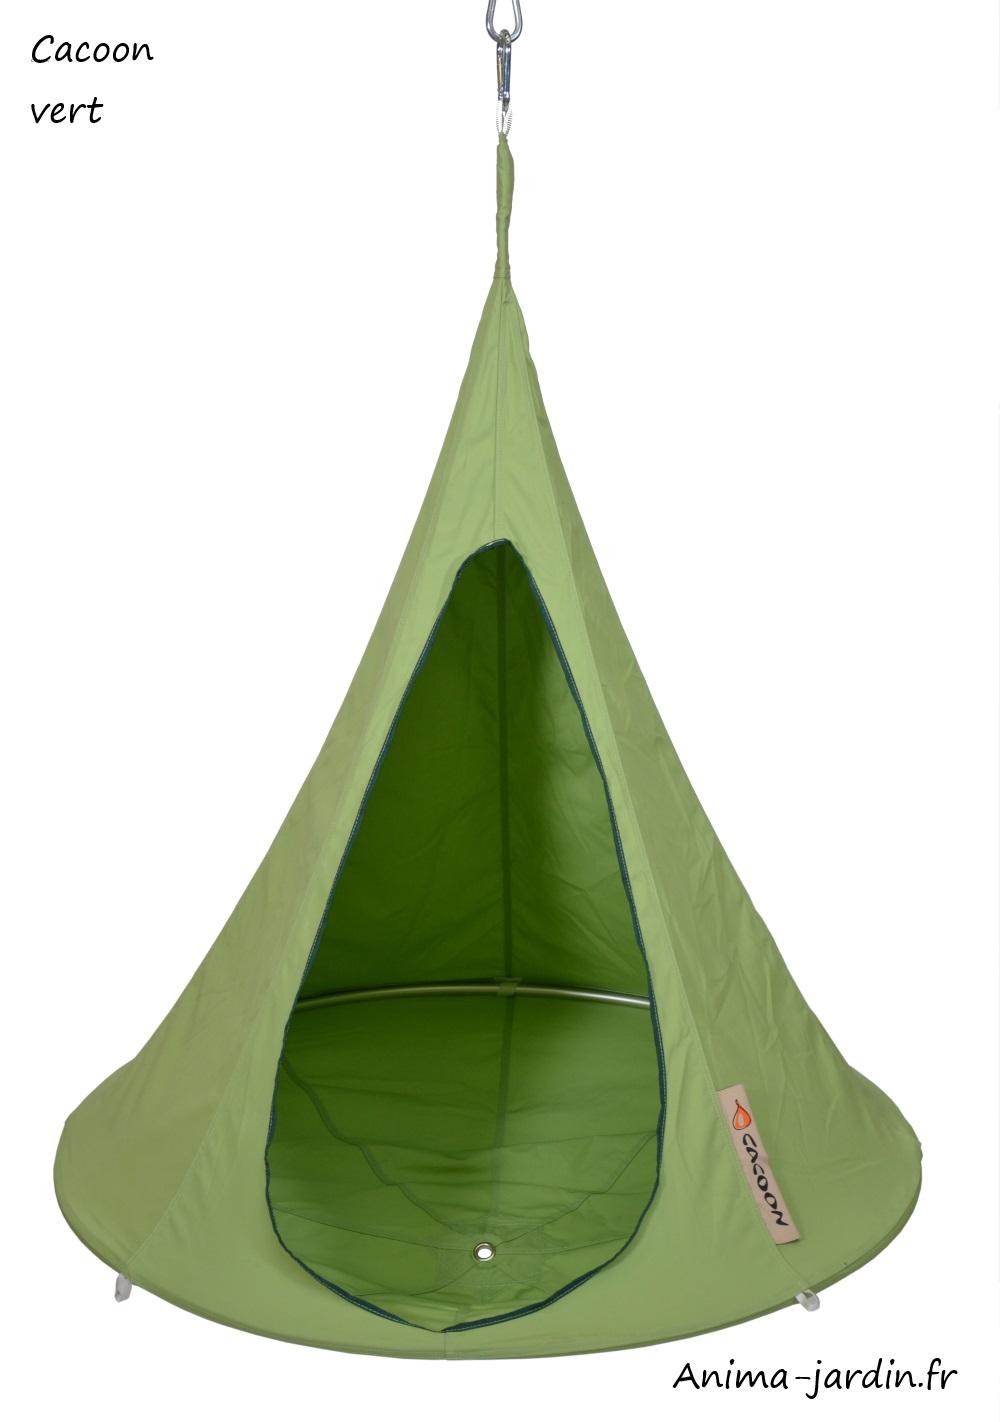 Cacoon Vert